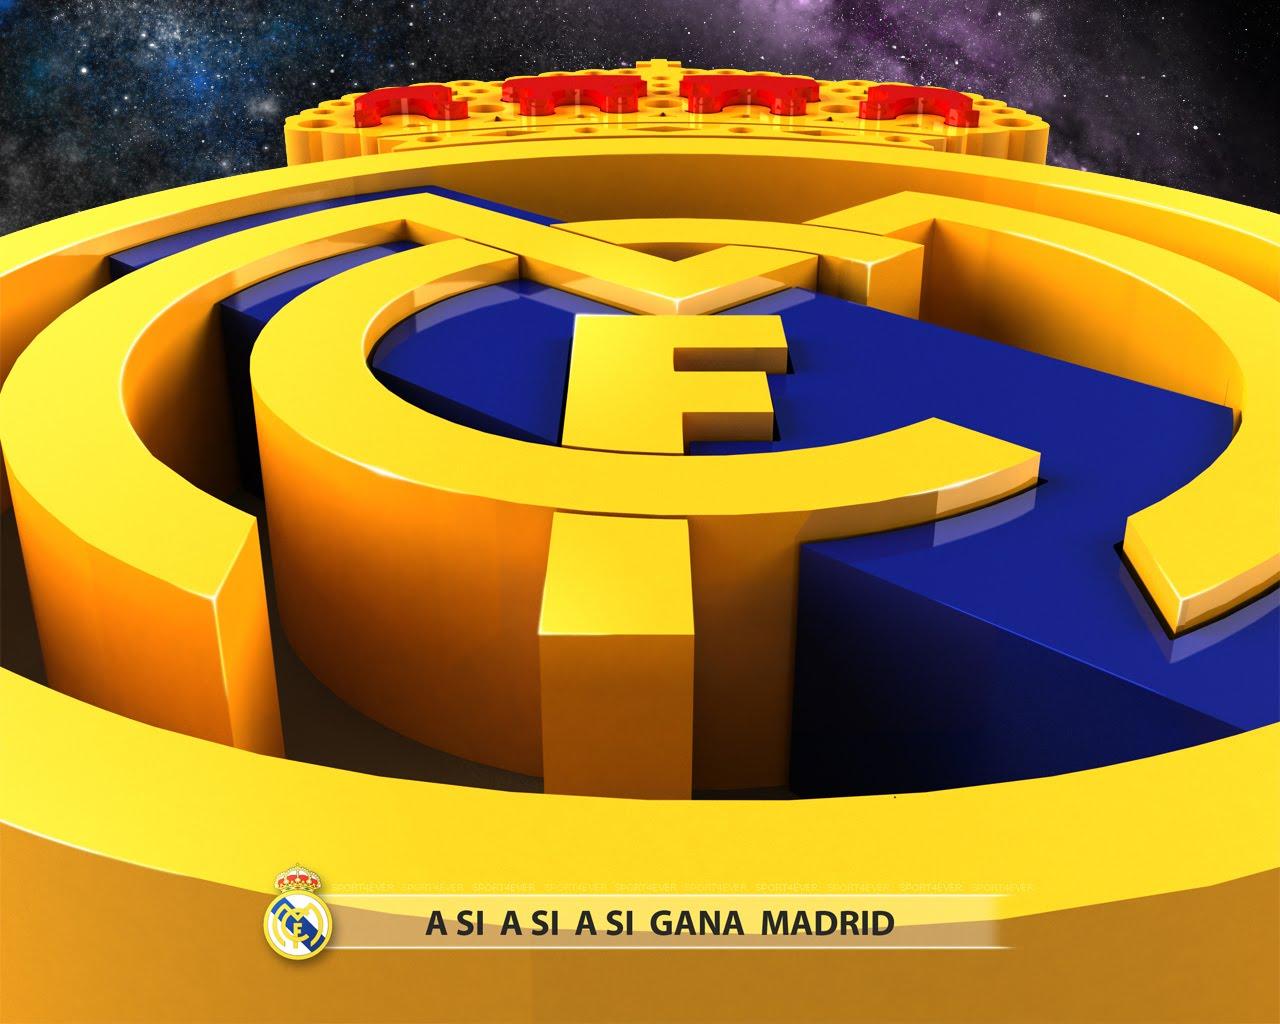 el real madrid club de futbol: